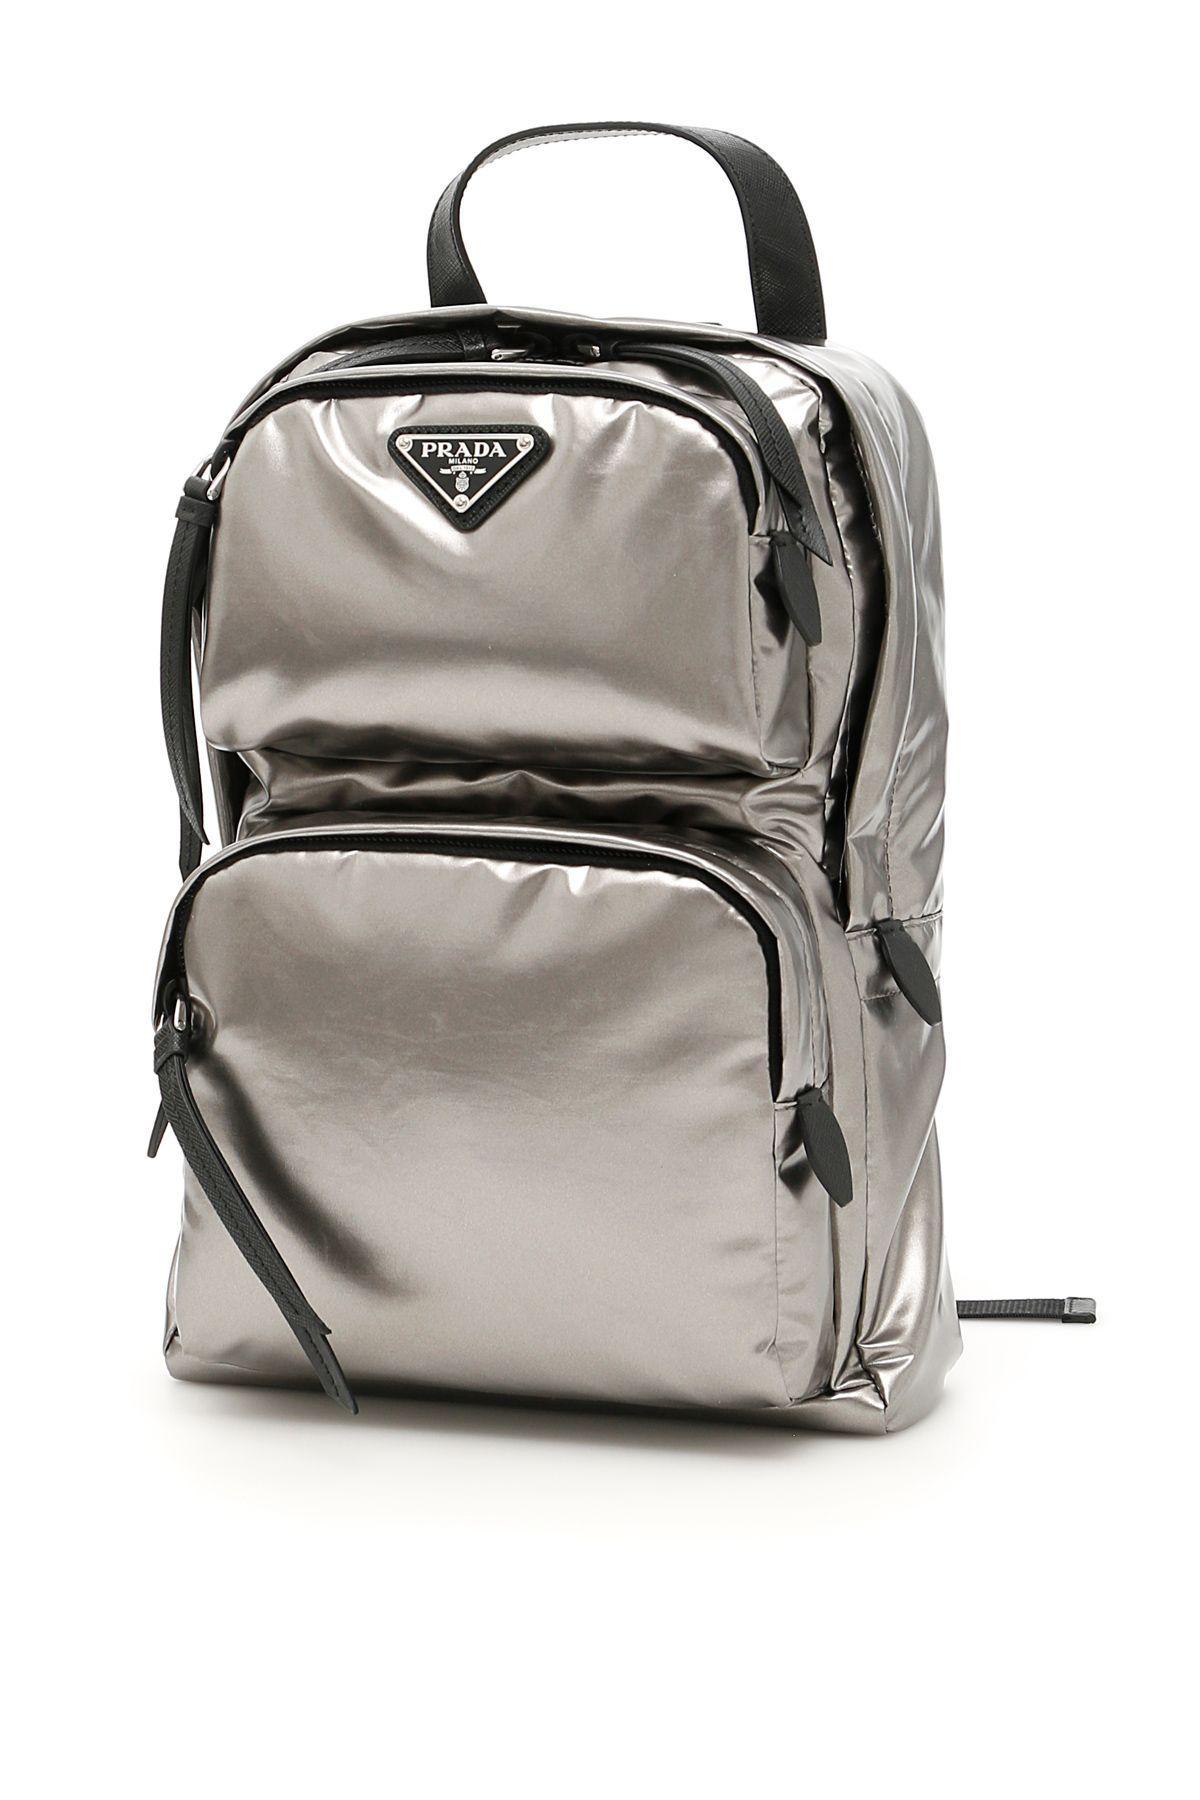 51d1ad8867c4 Prada Laminated Nylon One-Shoulder Backpack In Ferro Nerometallico ...